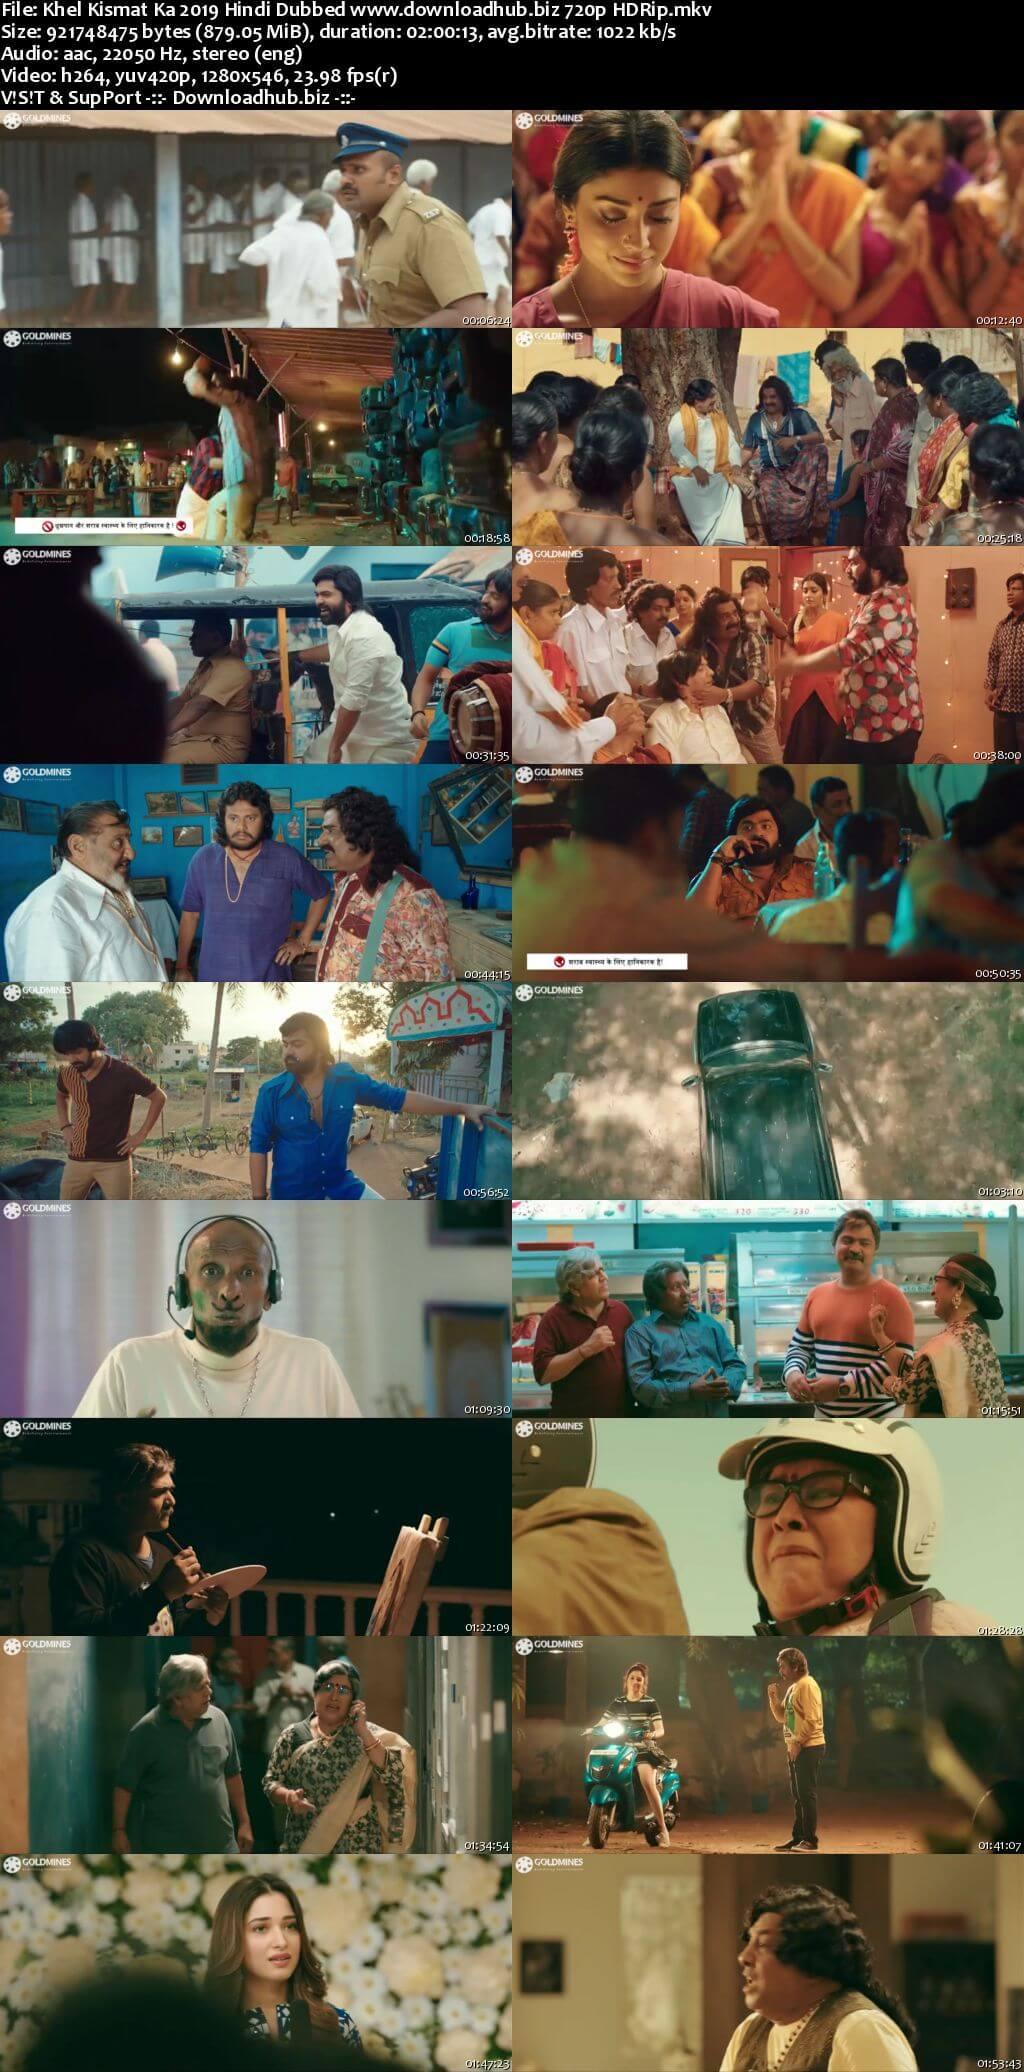 Khel Kismat Ka 2019 Hindi Dubbed 720p HDRip x264